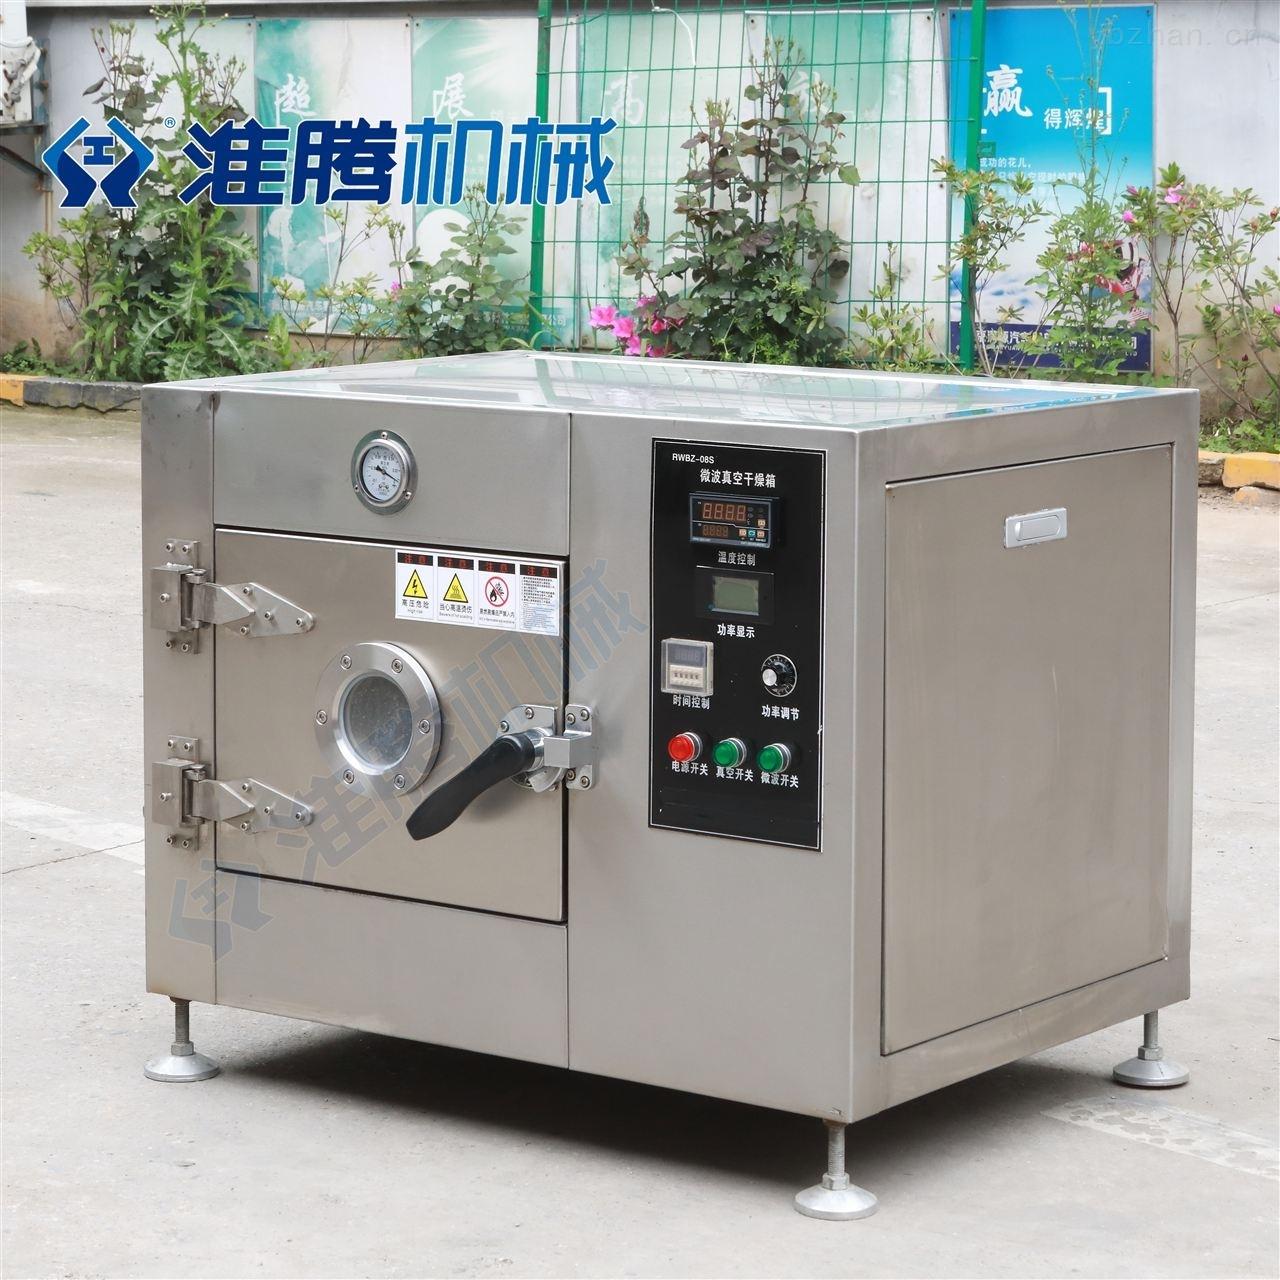 HTWB-1-可视化 实验室微波干燥机 厂商